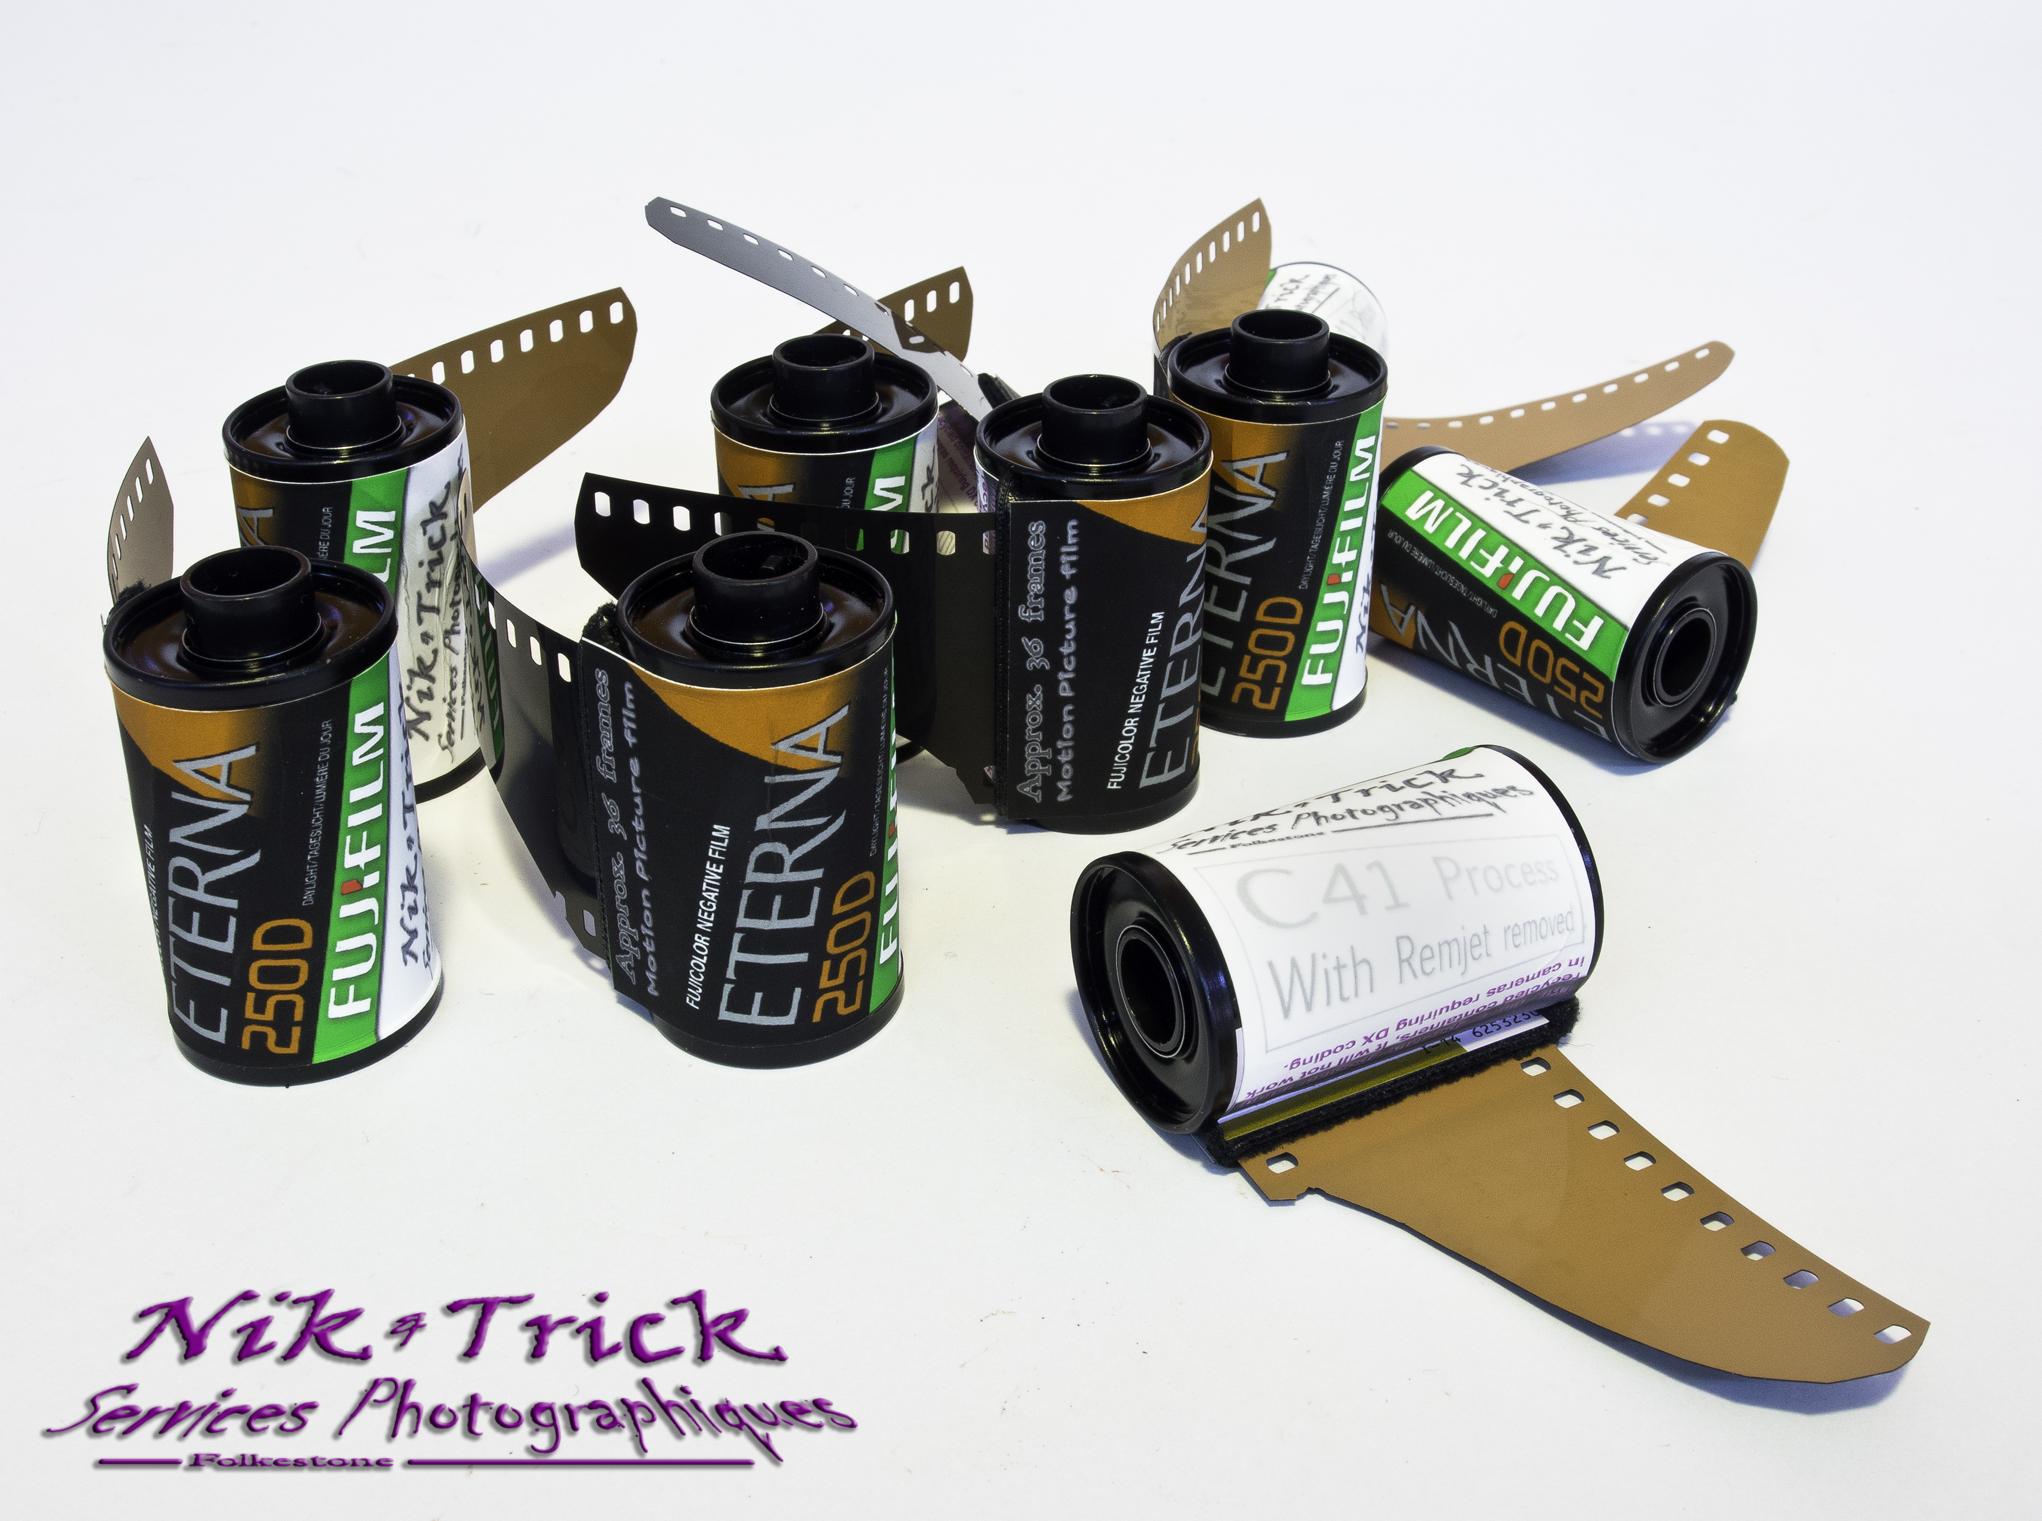 Kodak Motion Picture Films Our Vision Episode II Nik